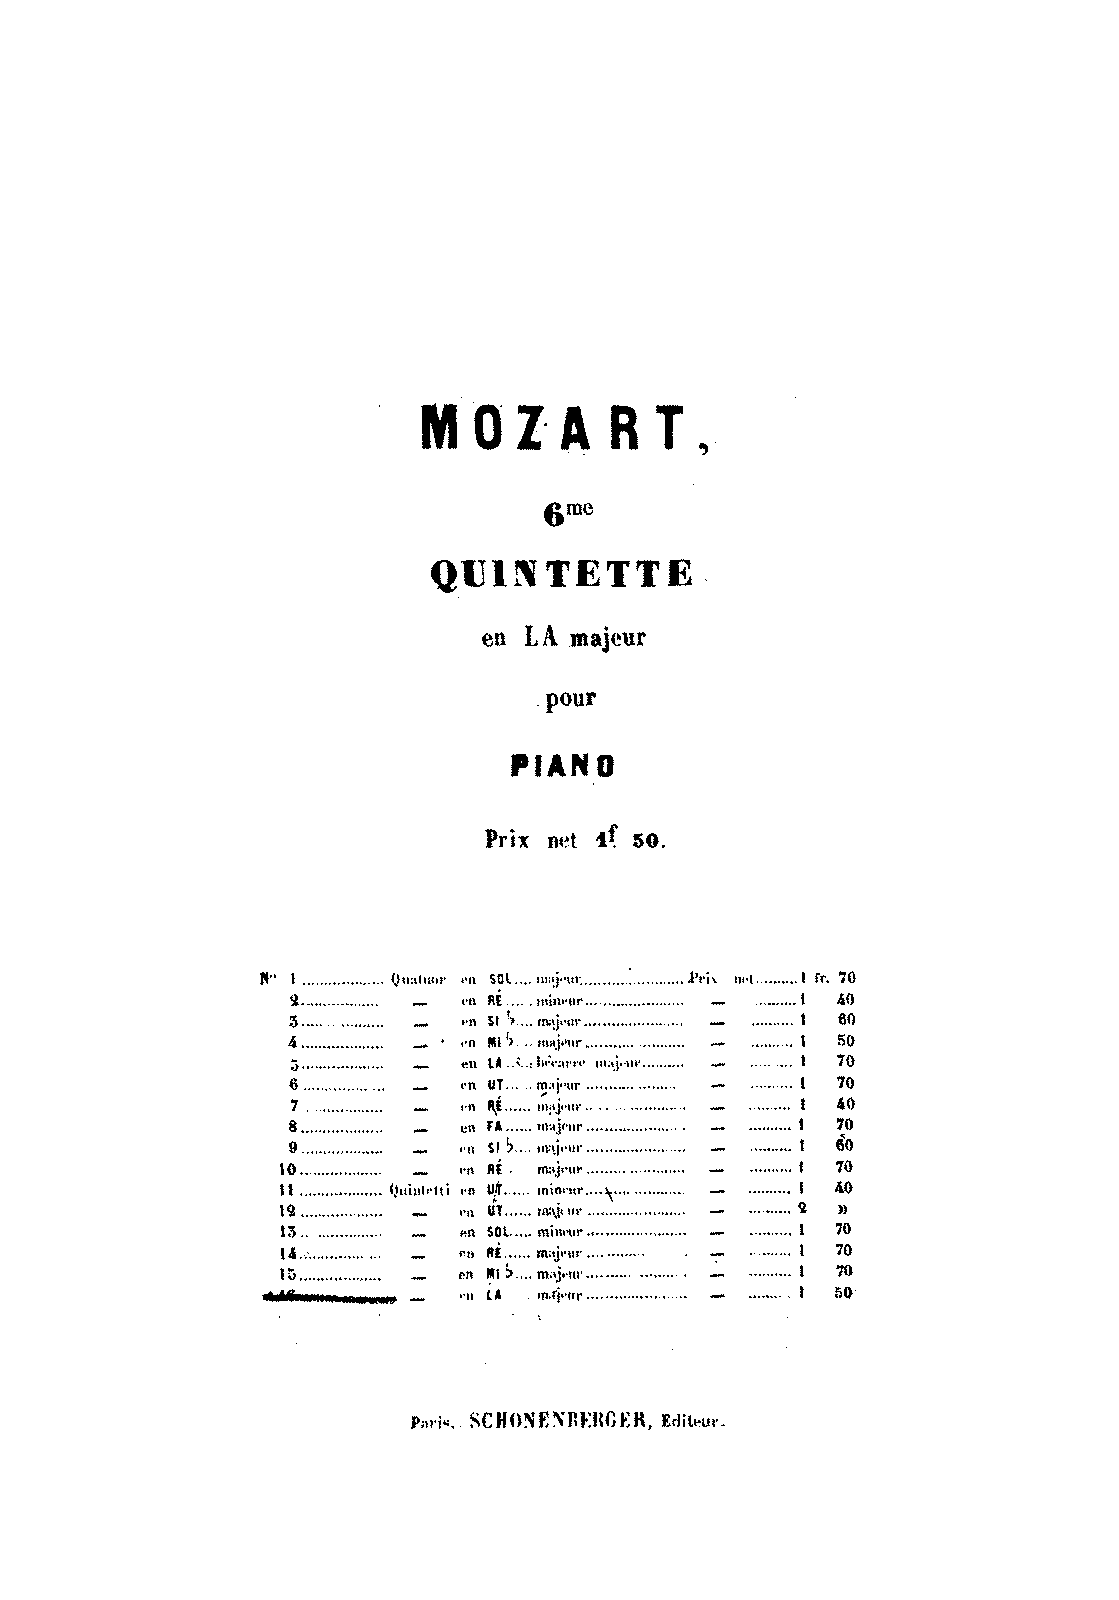 Clarinet Quintet in A major, K.581 (Mozart, Wolfgang